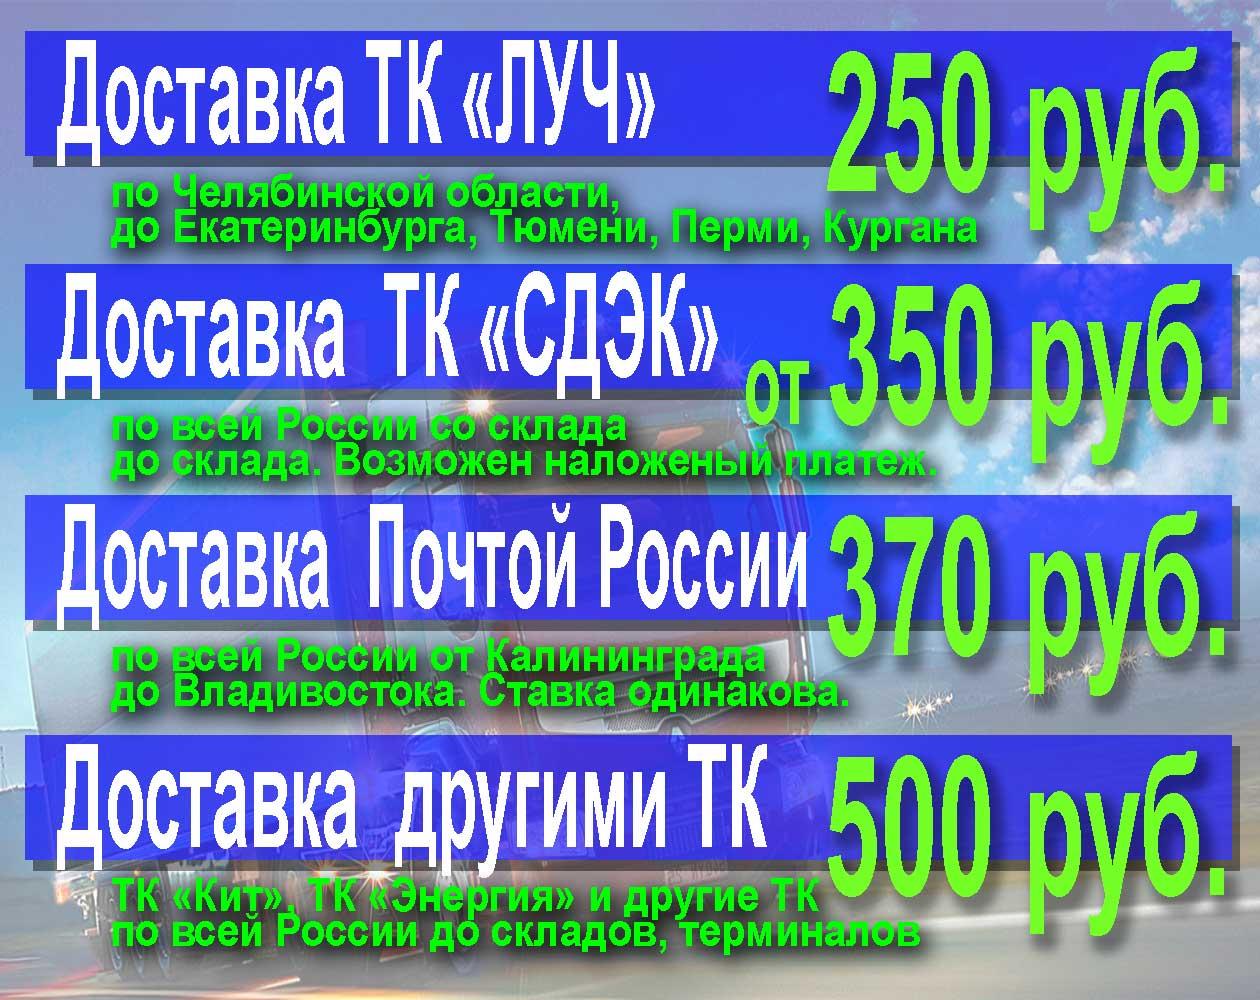 dostavka po Russia